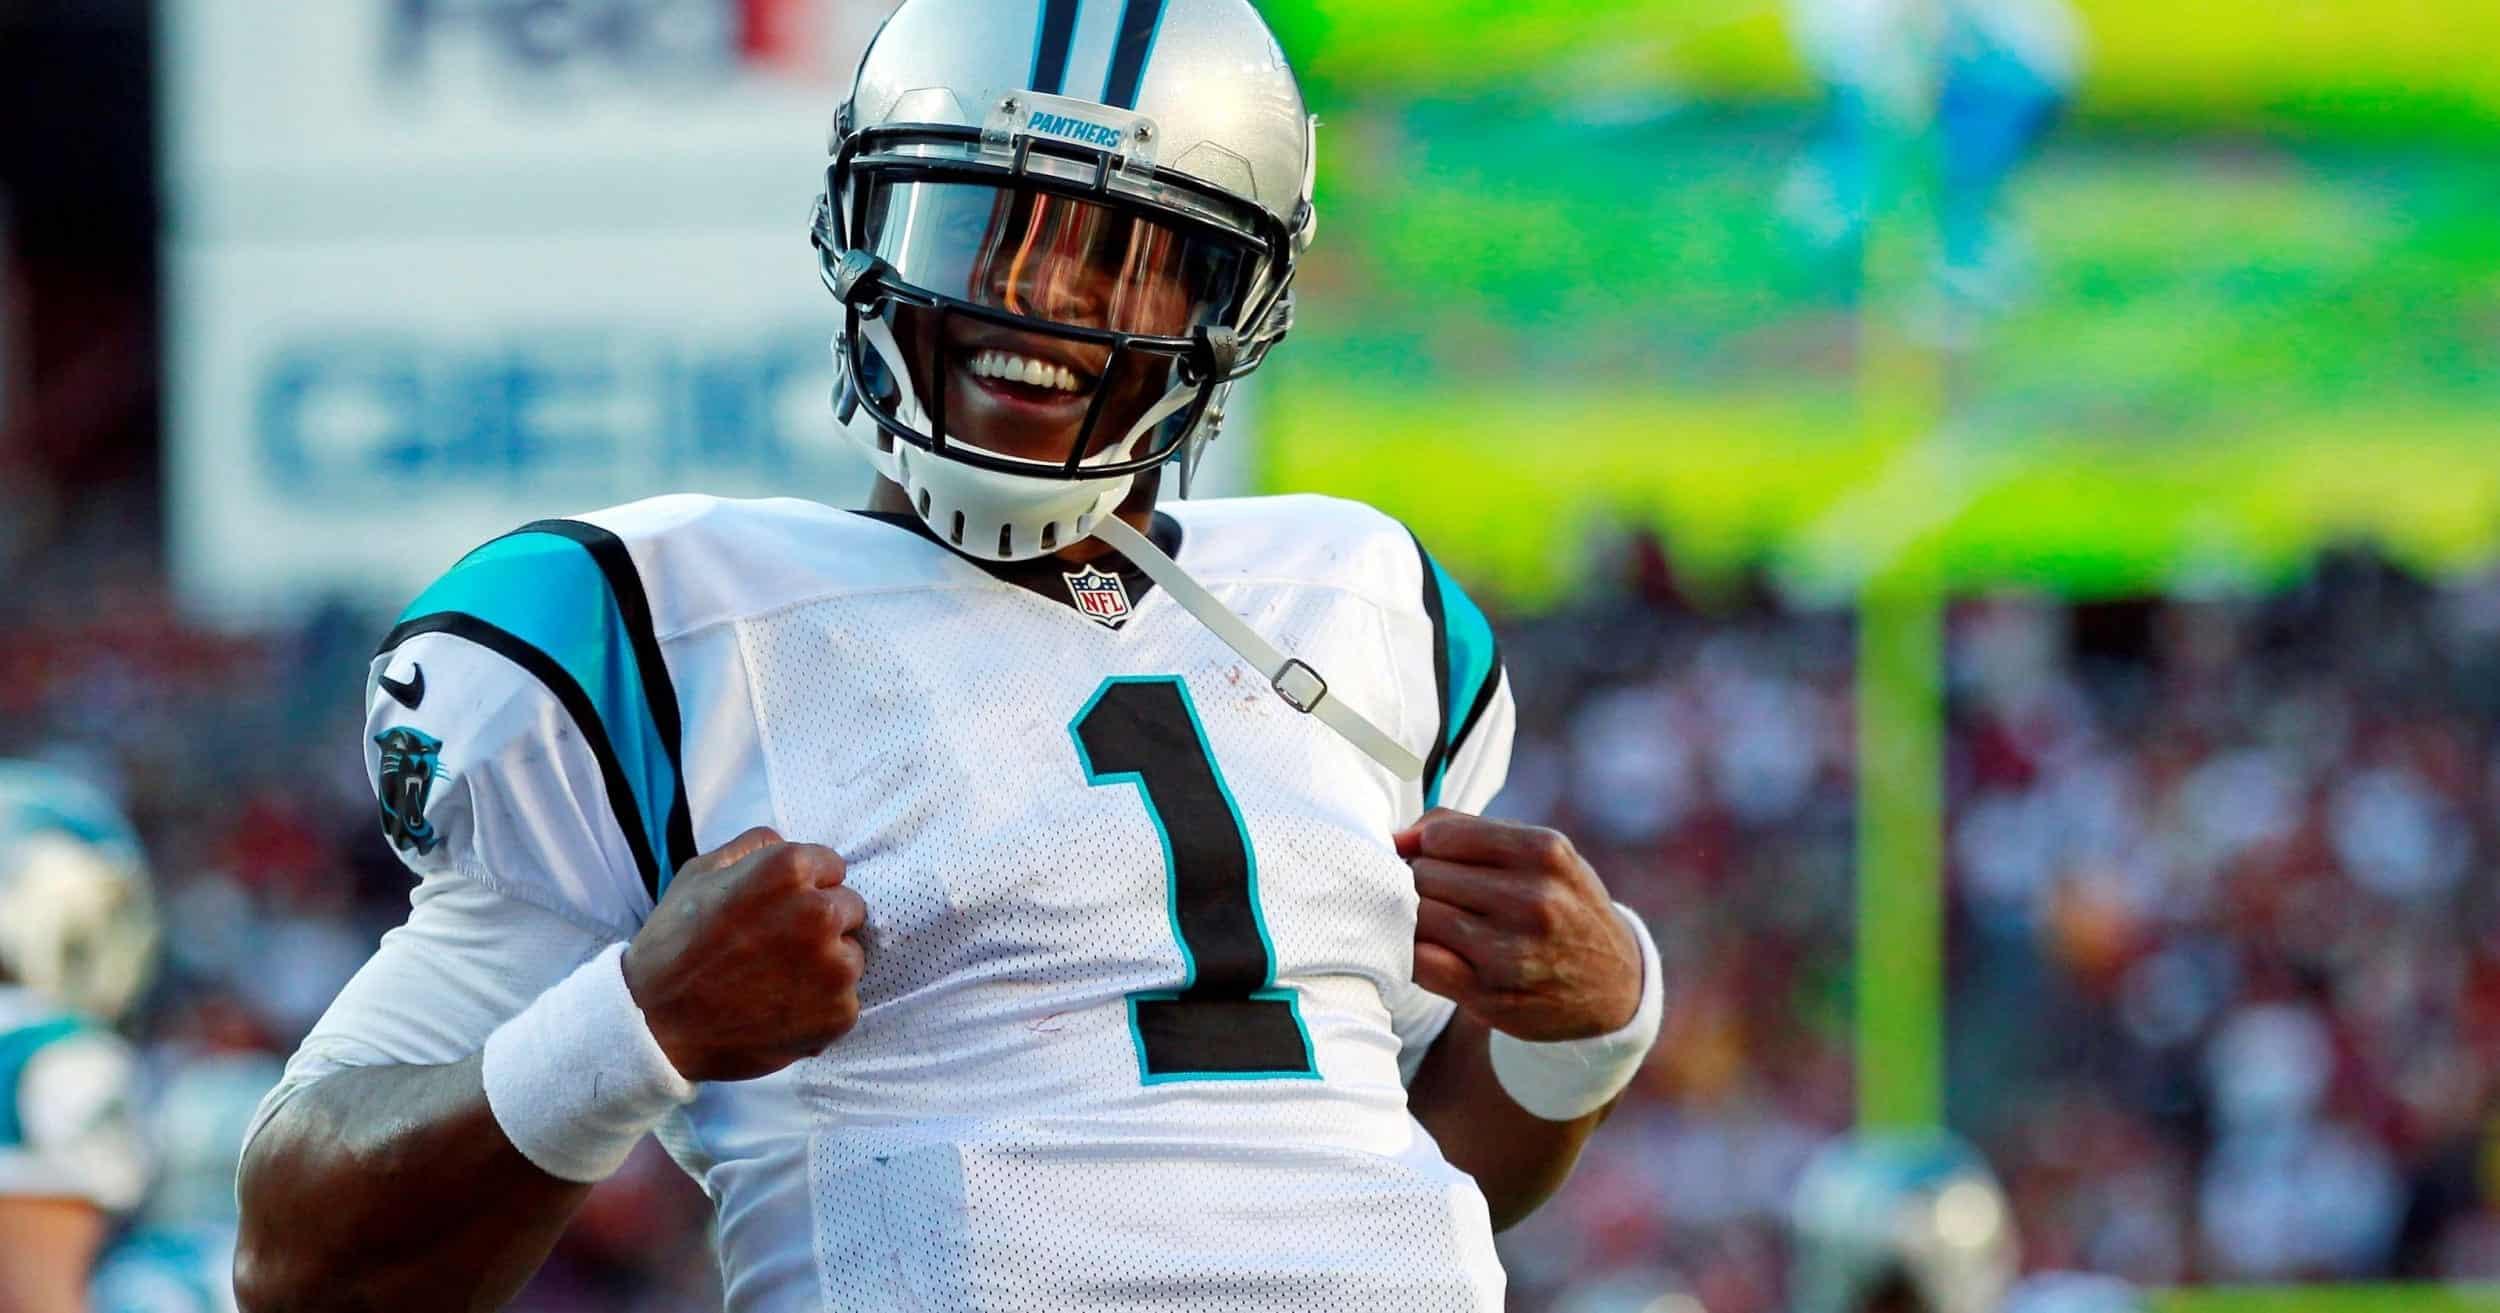 f20f17a9378378 2019 NFL Draft: Carolina Panthers 7-round mock draft 2.0